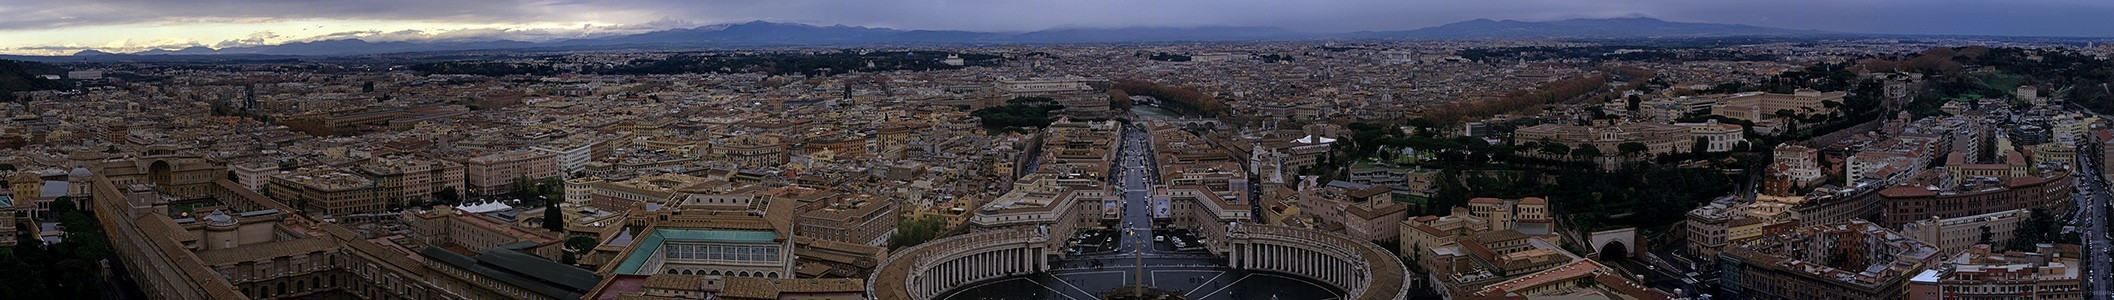 Vatikan Petersdom: Ausblick von der Kuppel